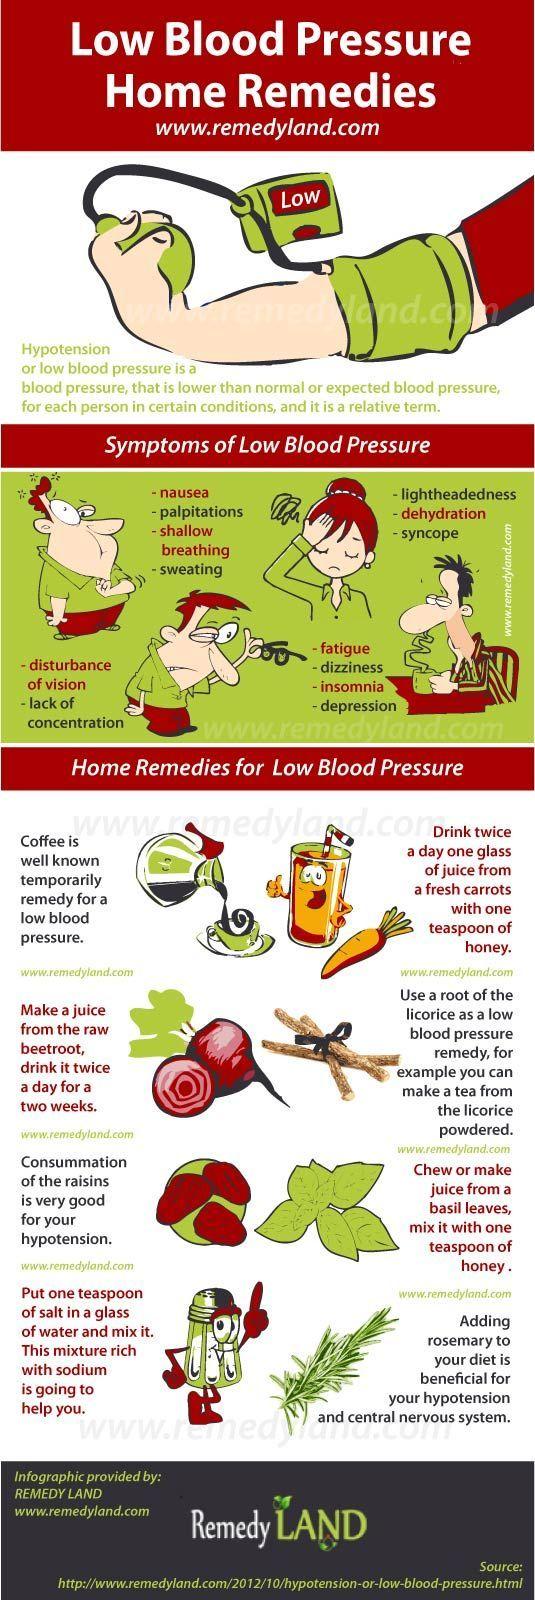 [Got Hypertension?]